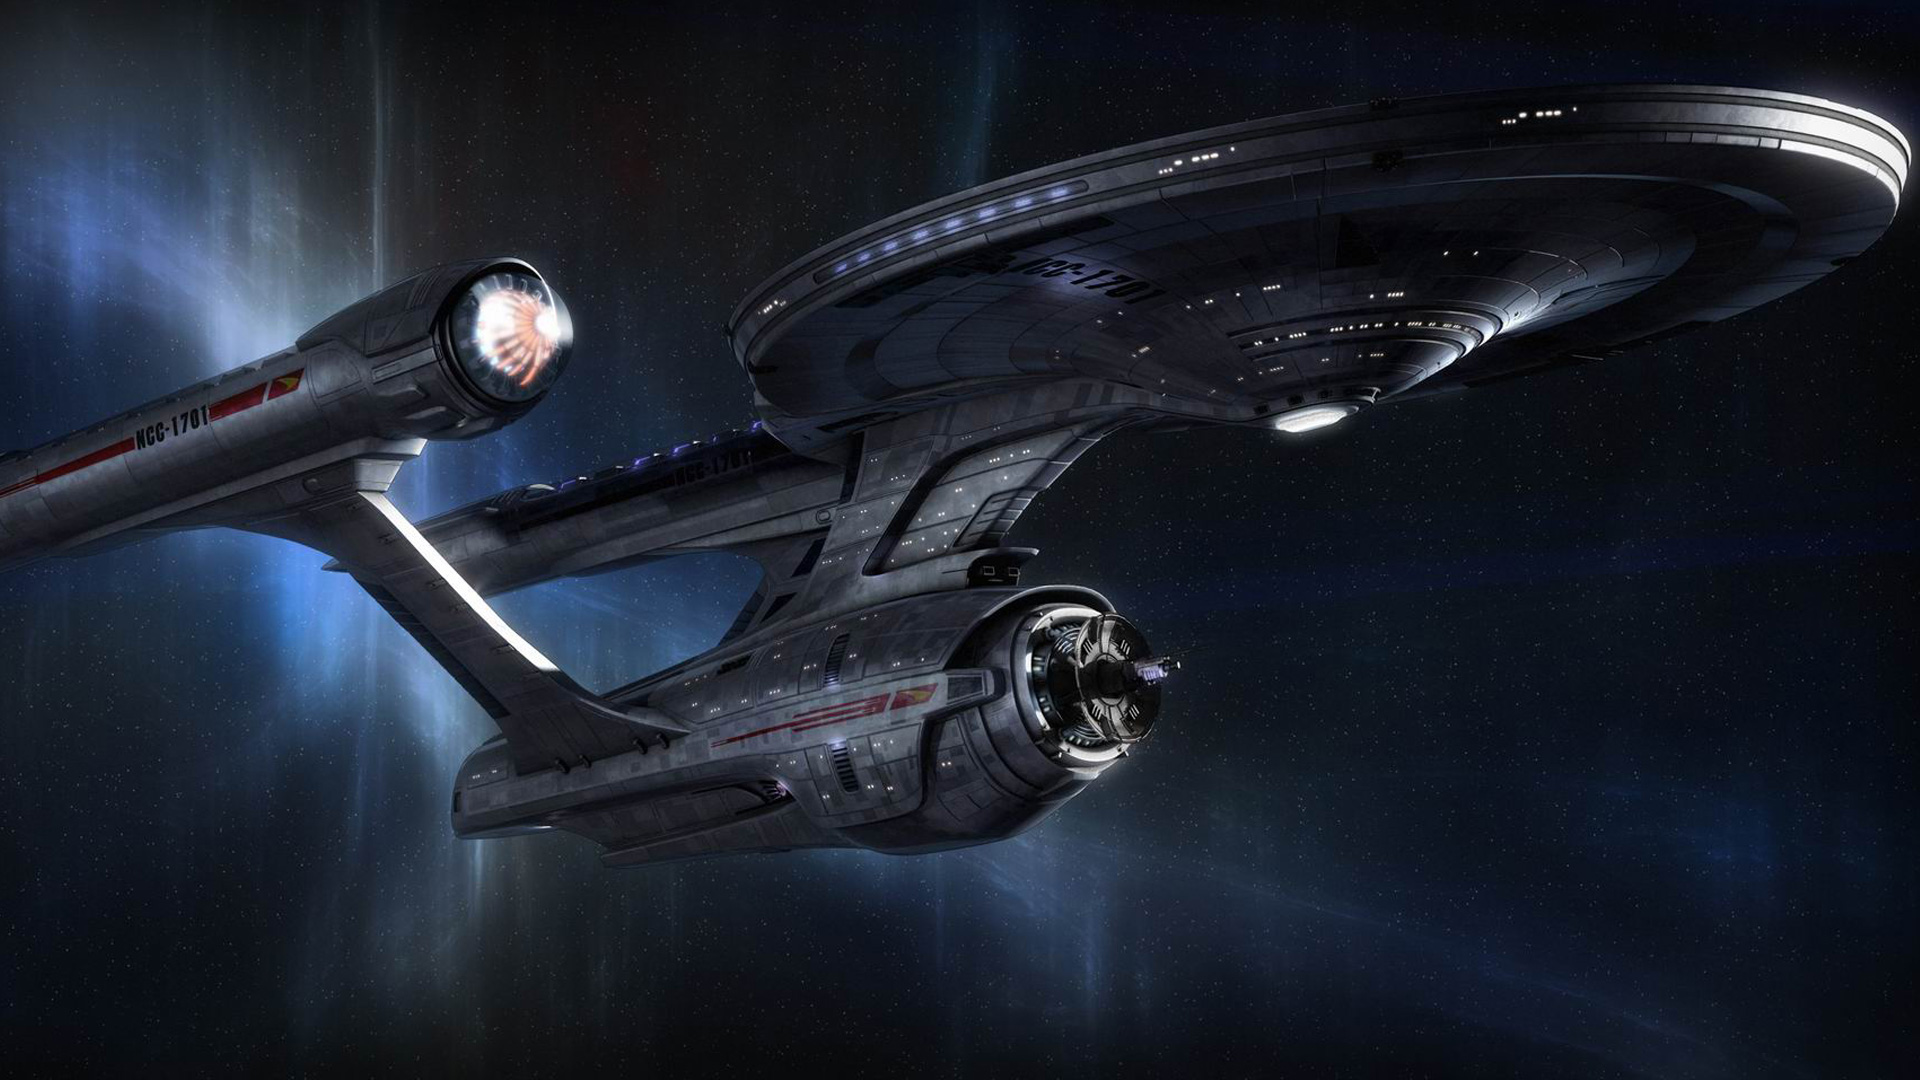 contentuploads201305Star Trek Classic Space Ship HD Wallpaperjpg 1920x1080